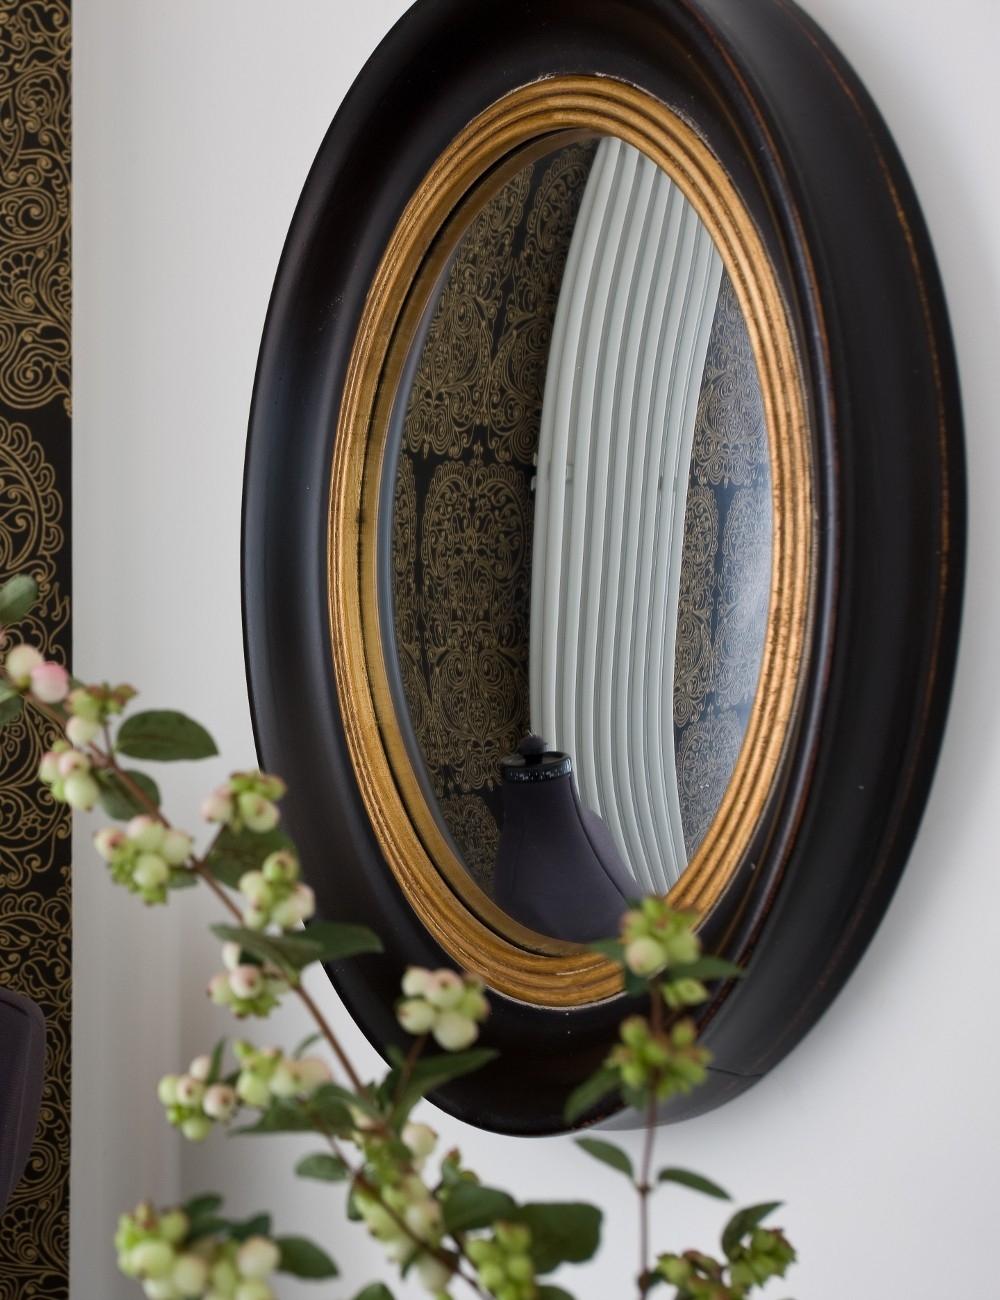 Round Decorative Fish Eye Convex Mirror Rose Grey Regarding Round Convex Mirrors (Image 12 of 15)